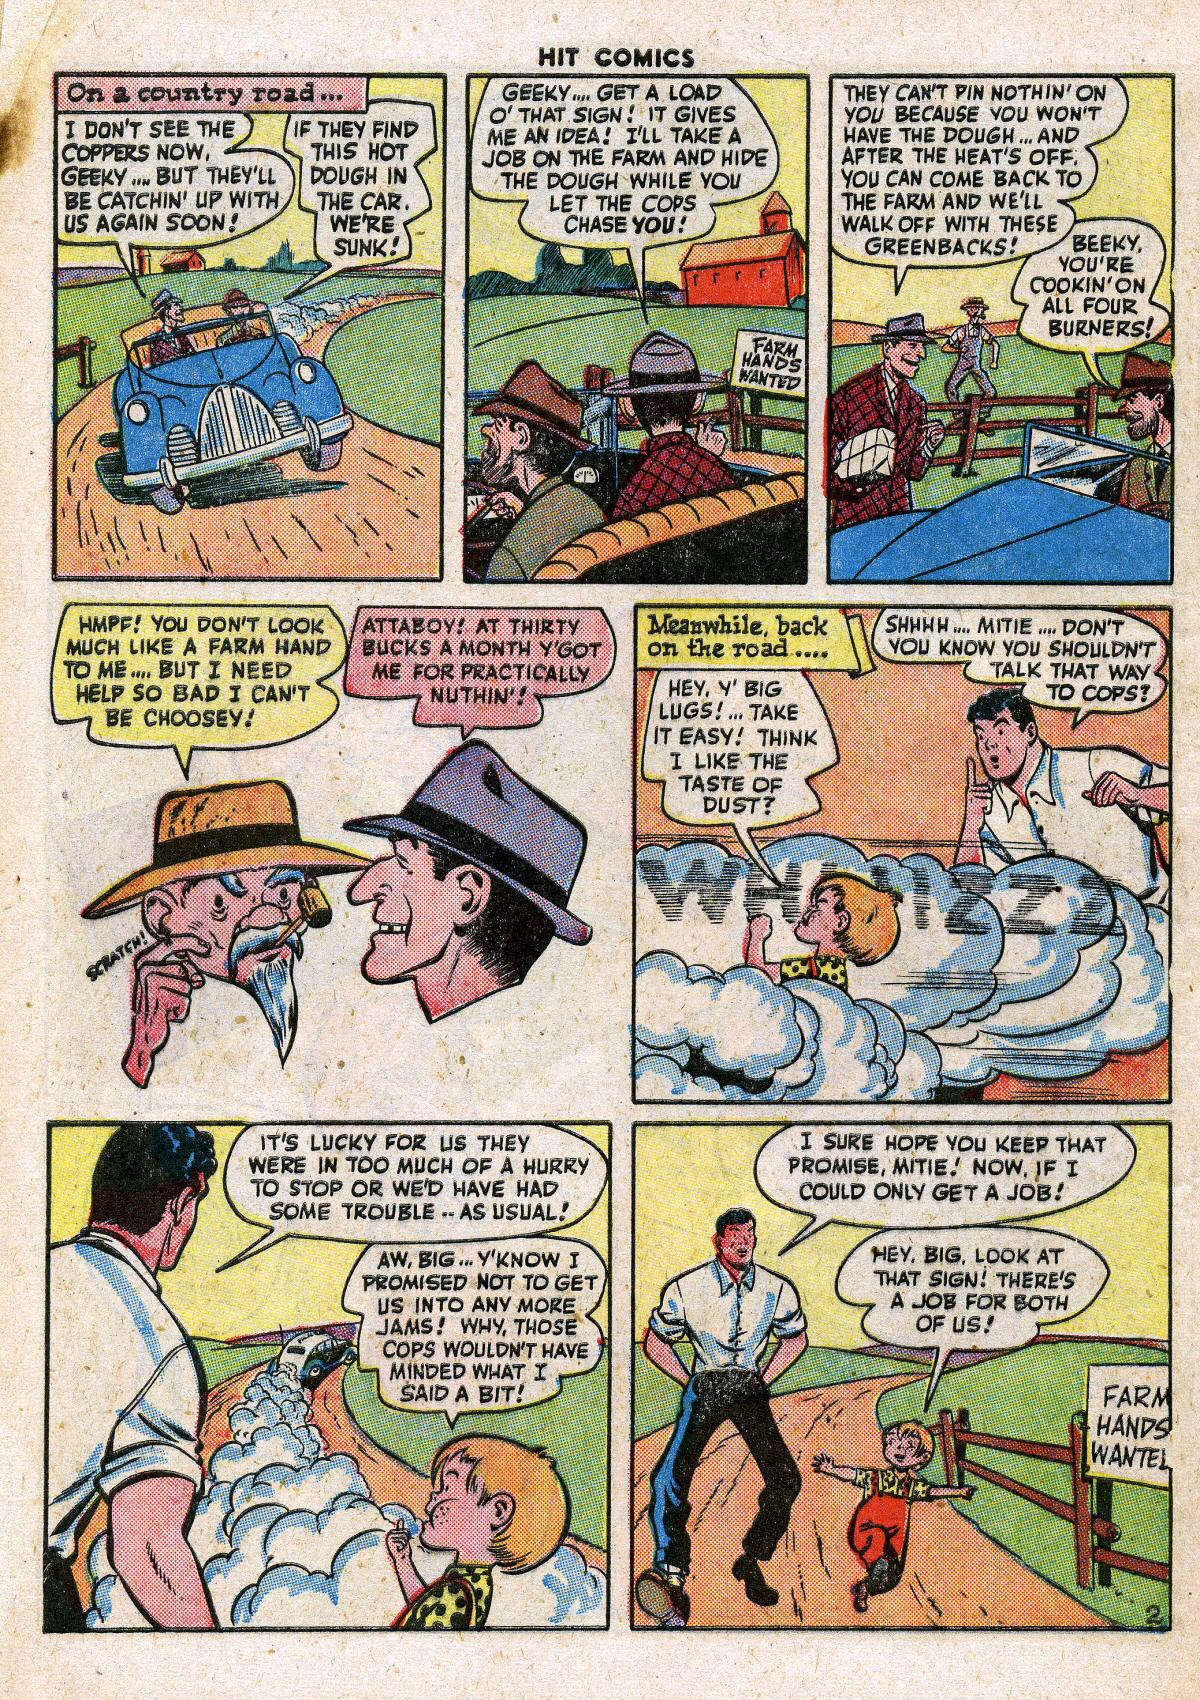 Read online Hit Comics comic -  Issue #41 - 52